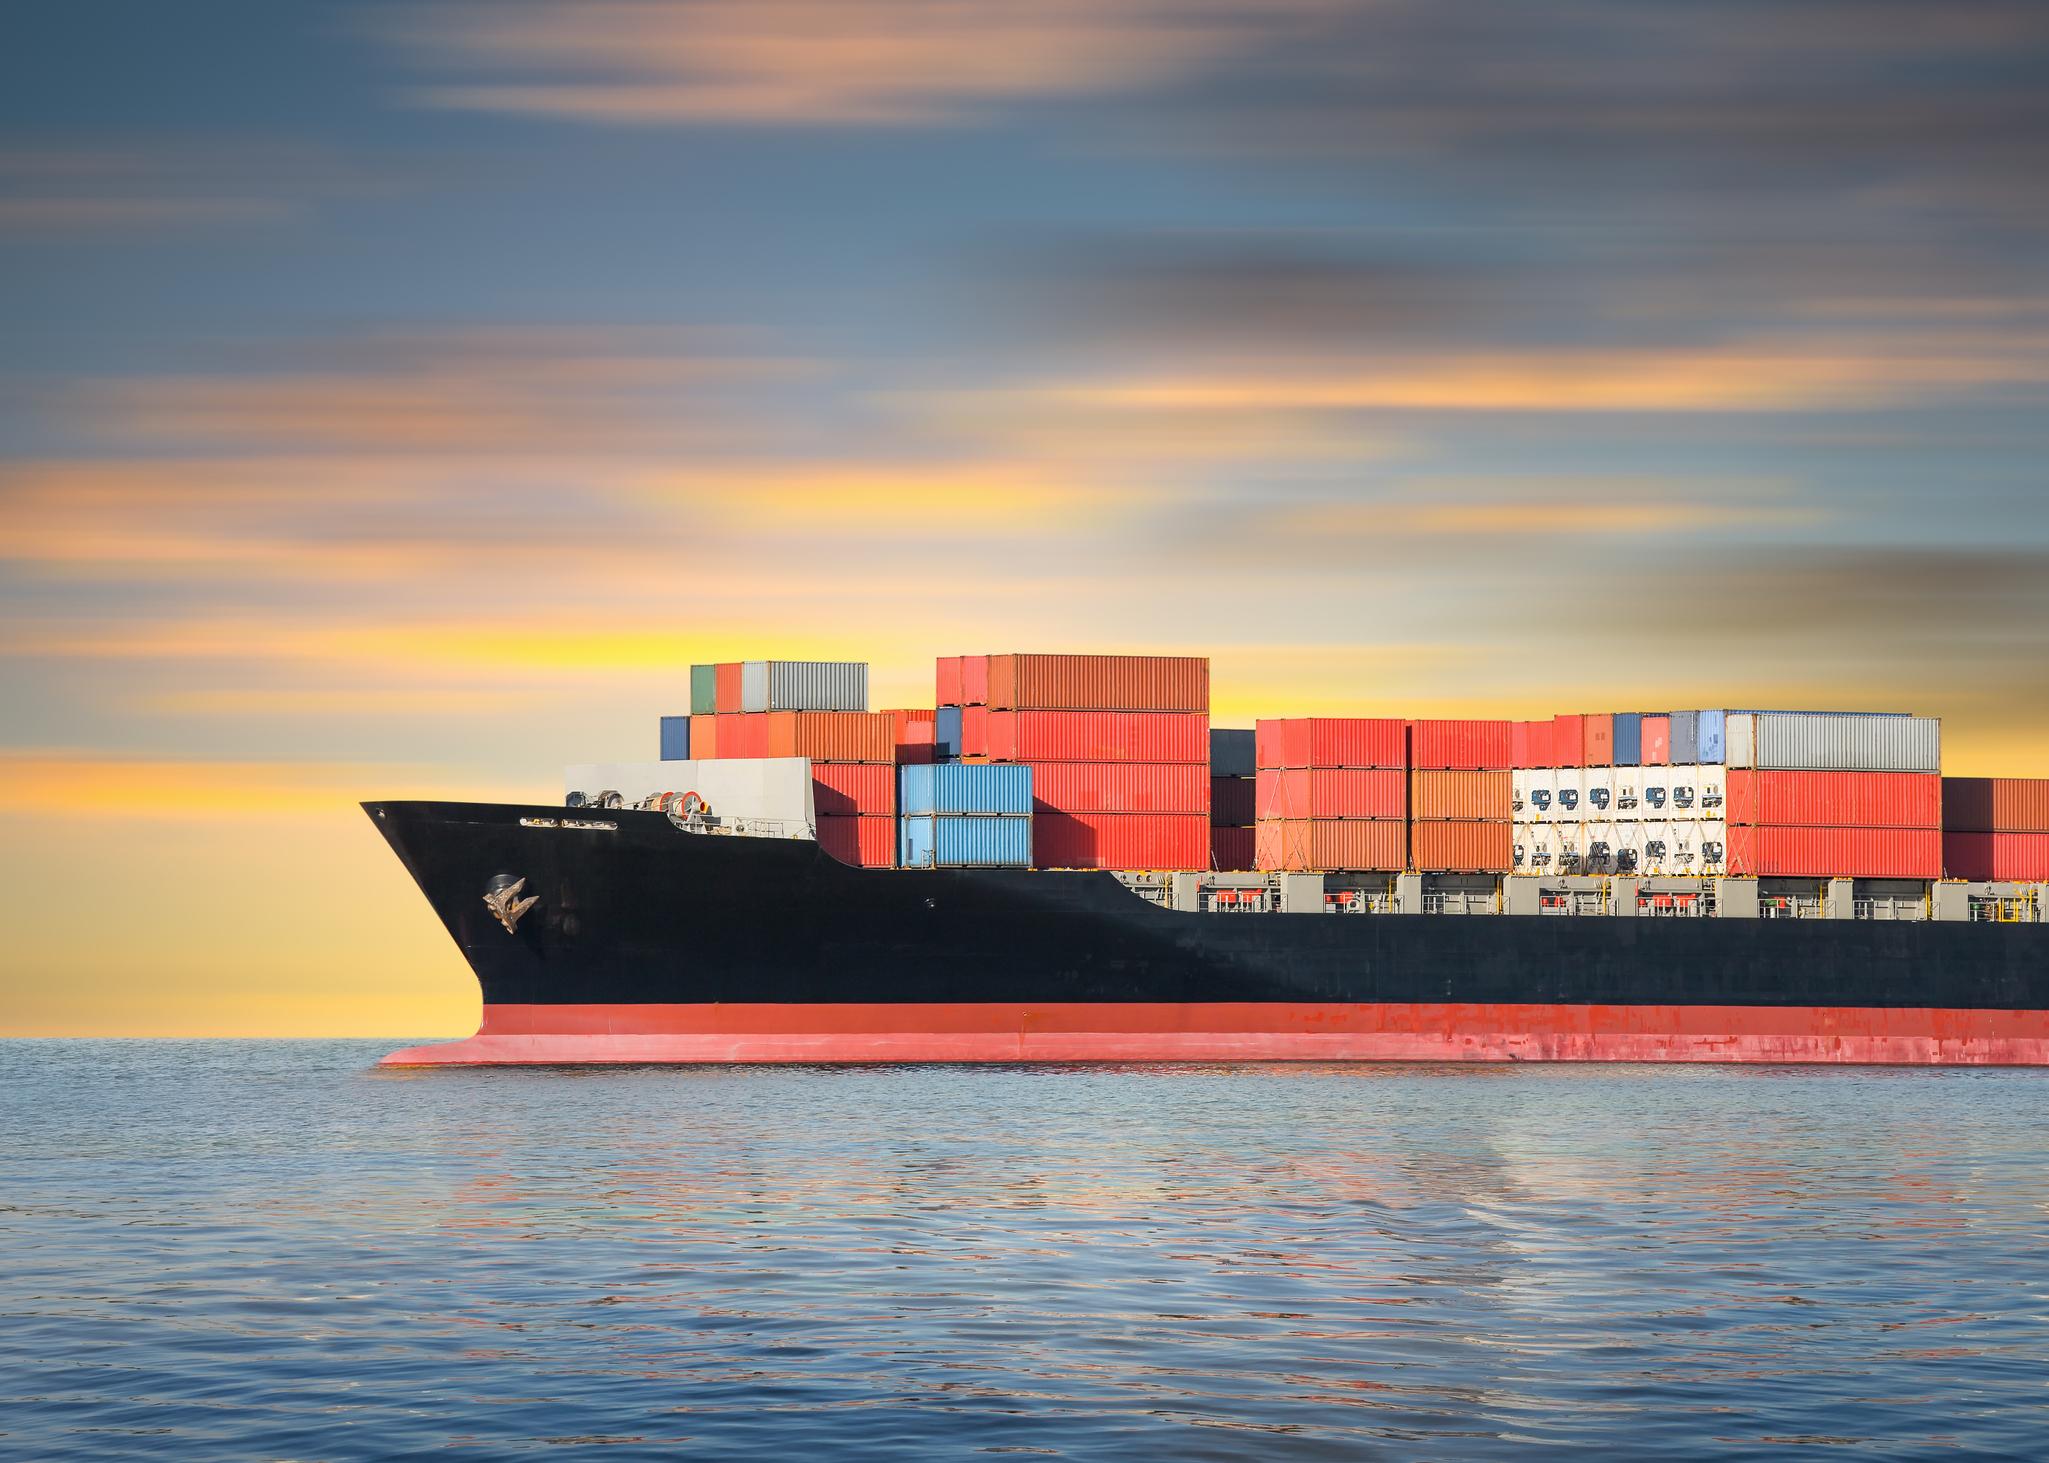 Cargo ship sailing in ocean at dawn or dusk.